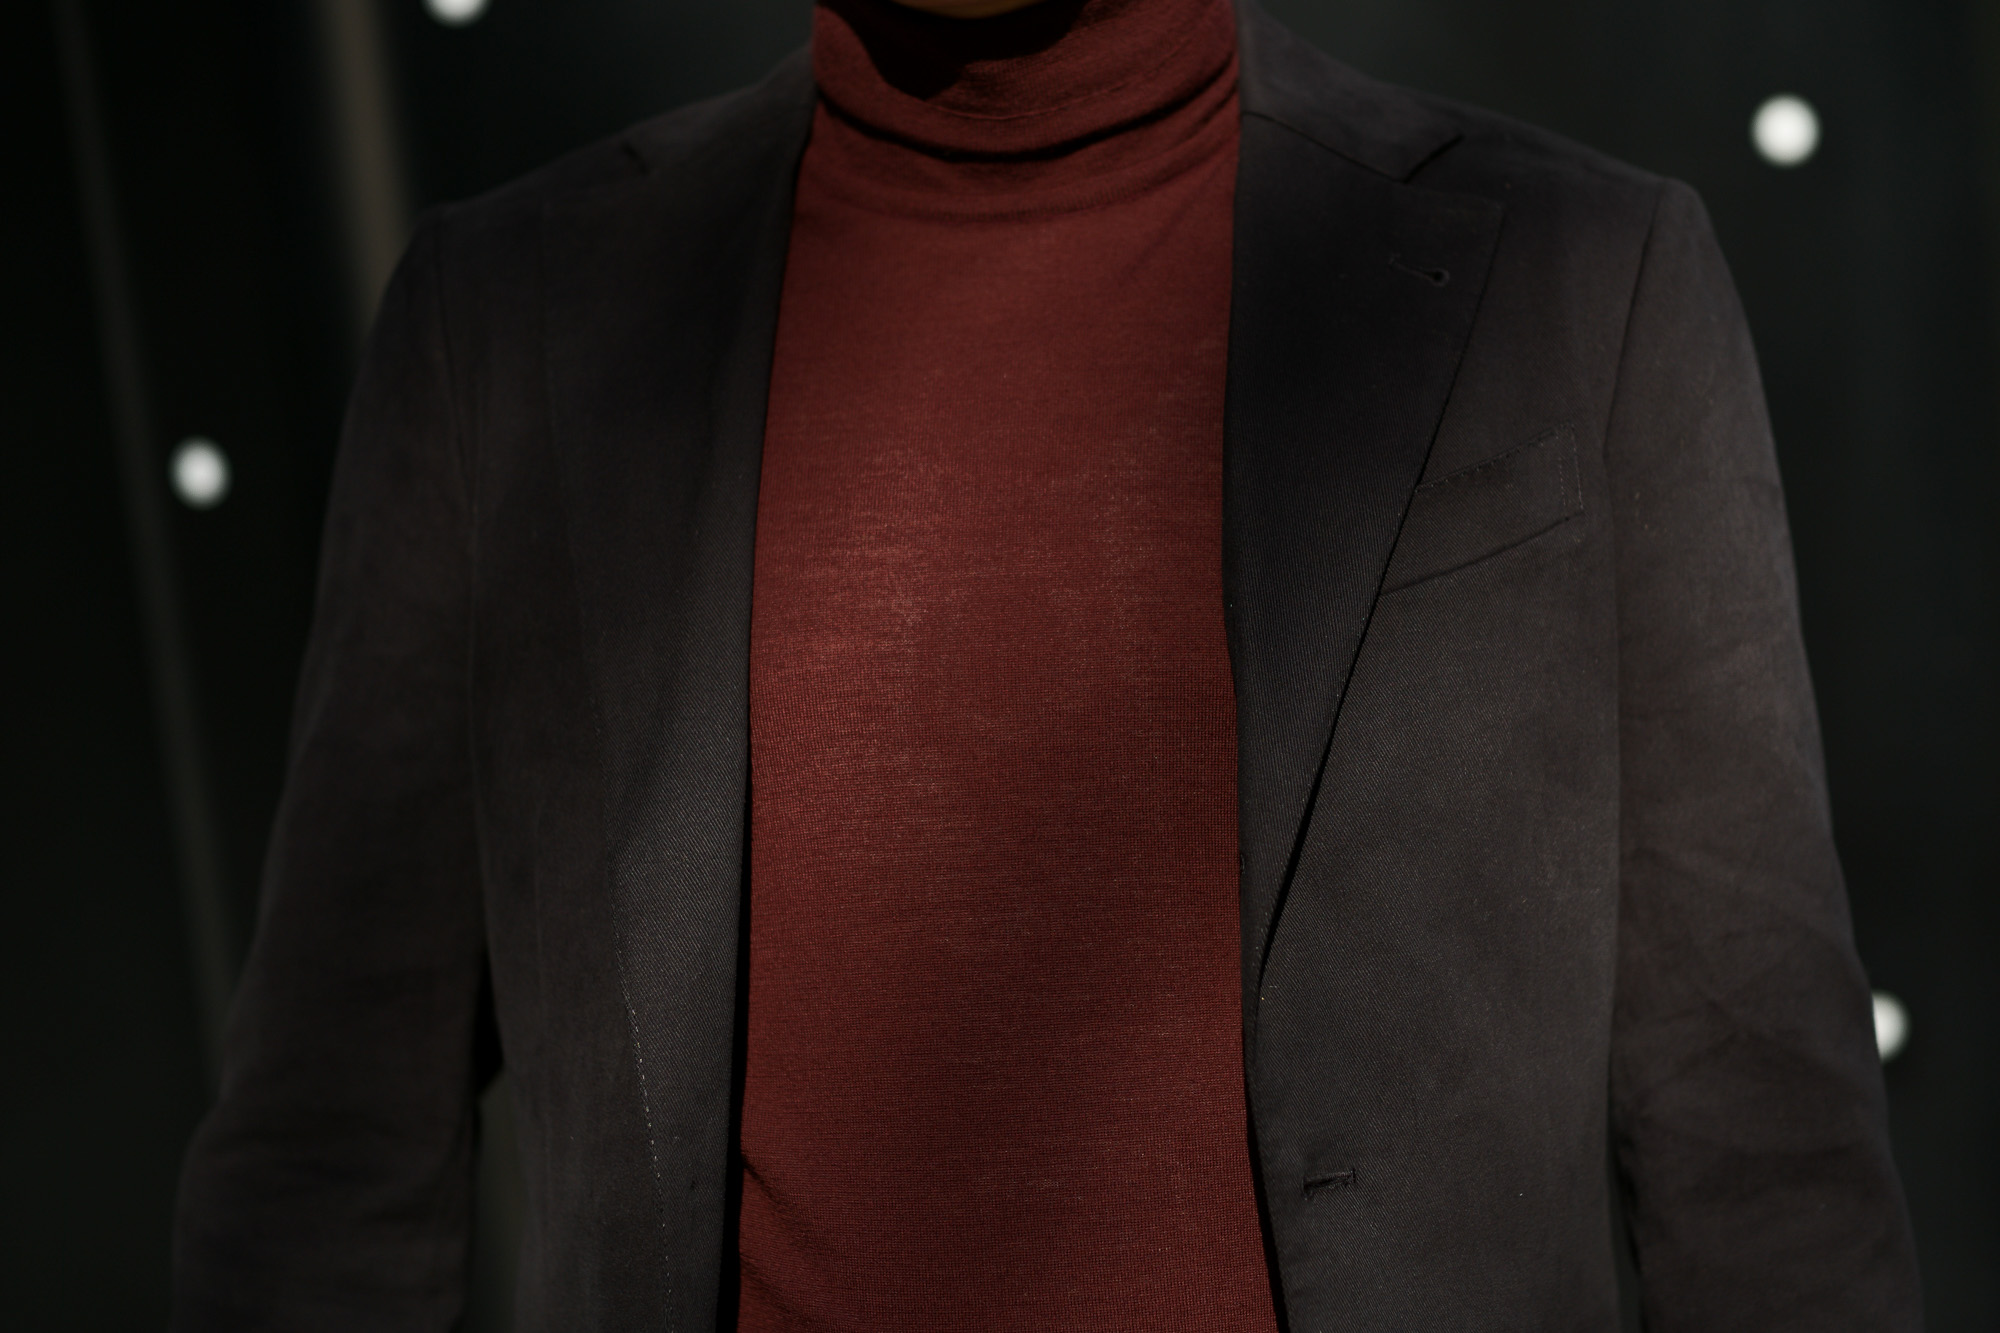 Cuervo (クエルボ) Sartoria Collection (サルトリア コレクション) Rooster (ルースター) STRETCH COTTON ストレッチコットン スーツ BLACK (ブラック) MADE IN JAPAN (日本製) 2019 春夏新作 【第2便ご予約受付開始】 alto e diritto アルトエデリット